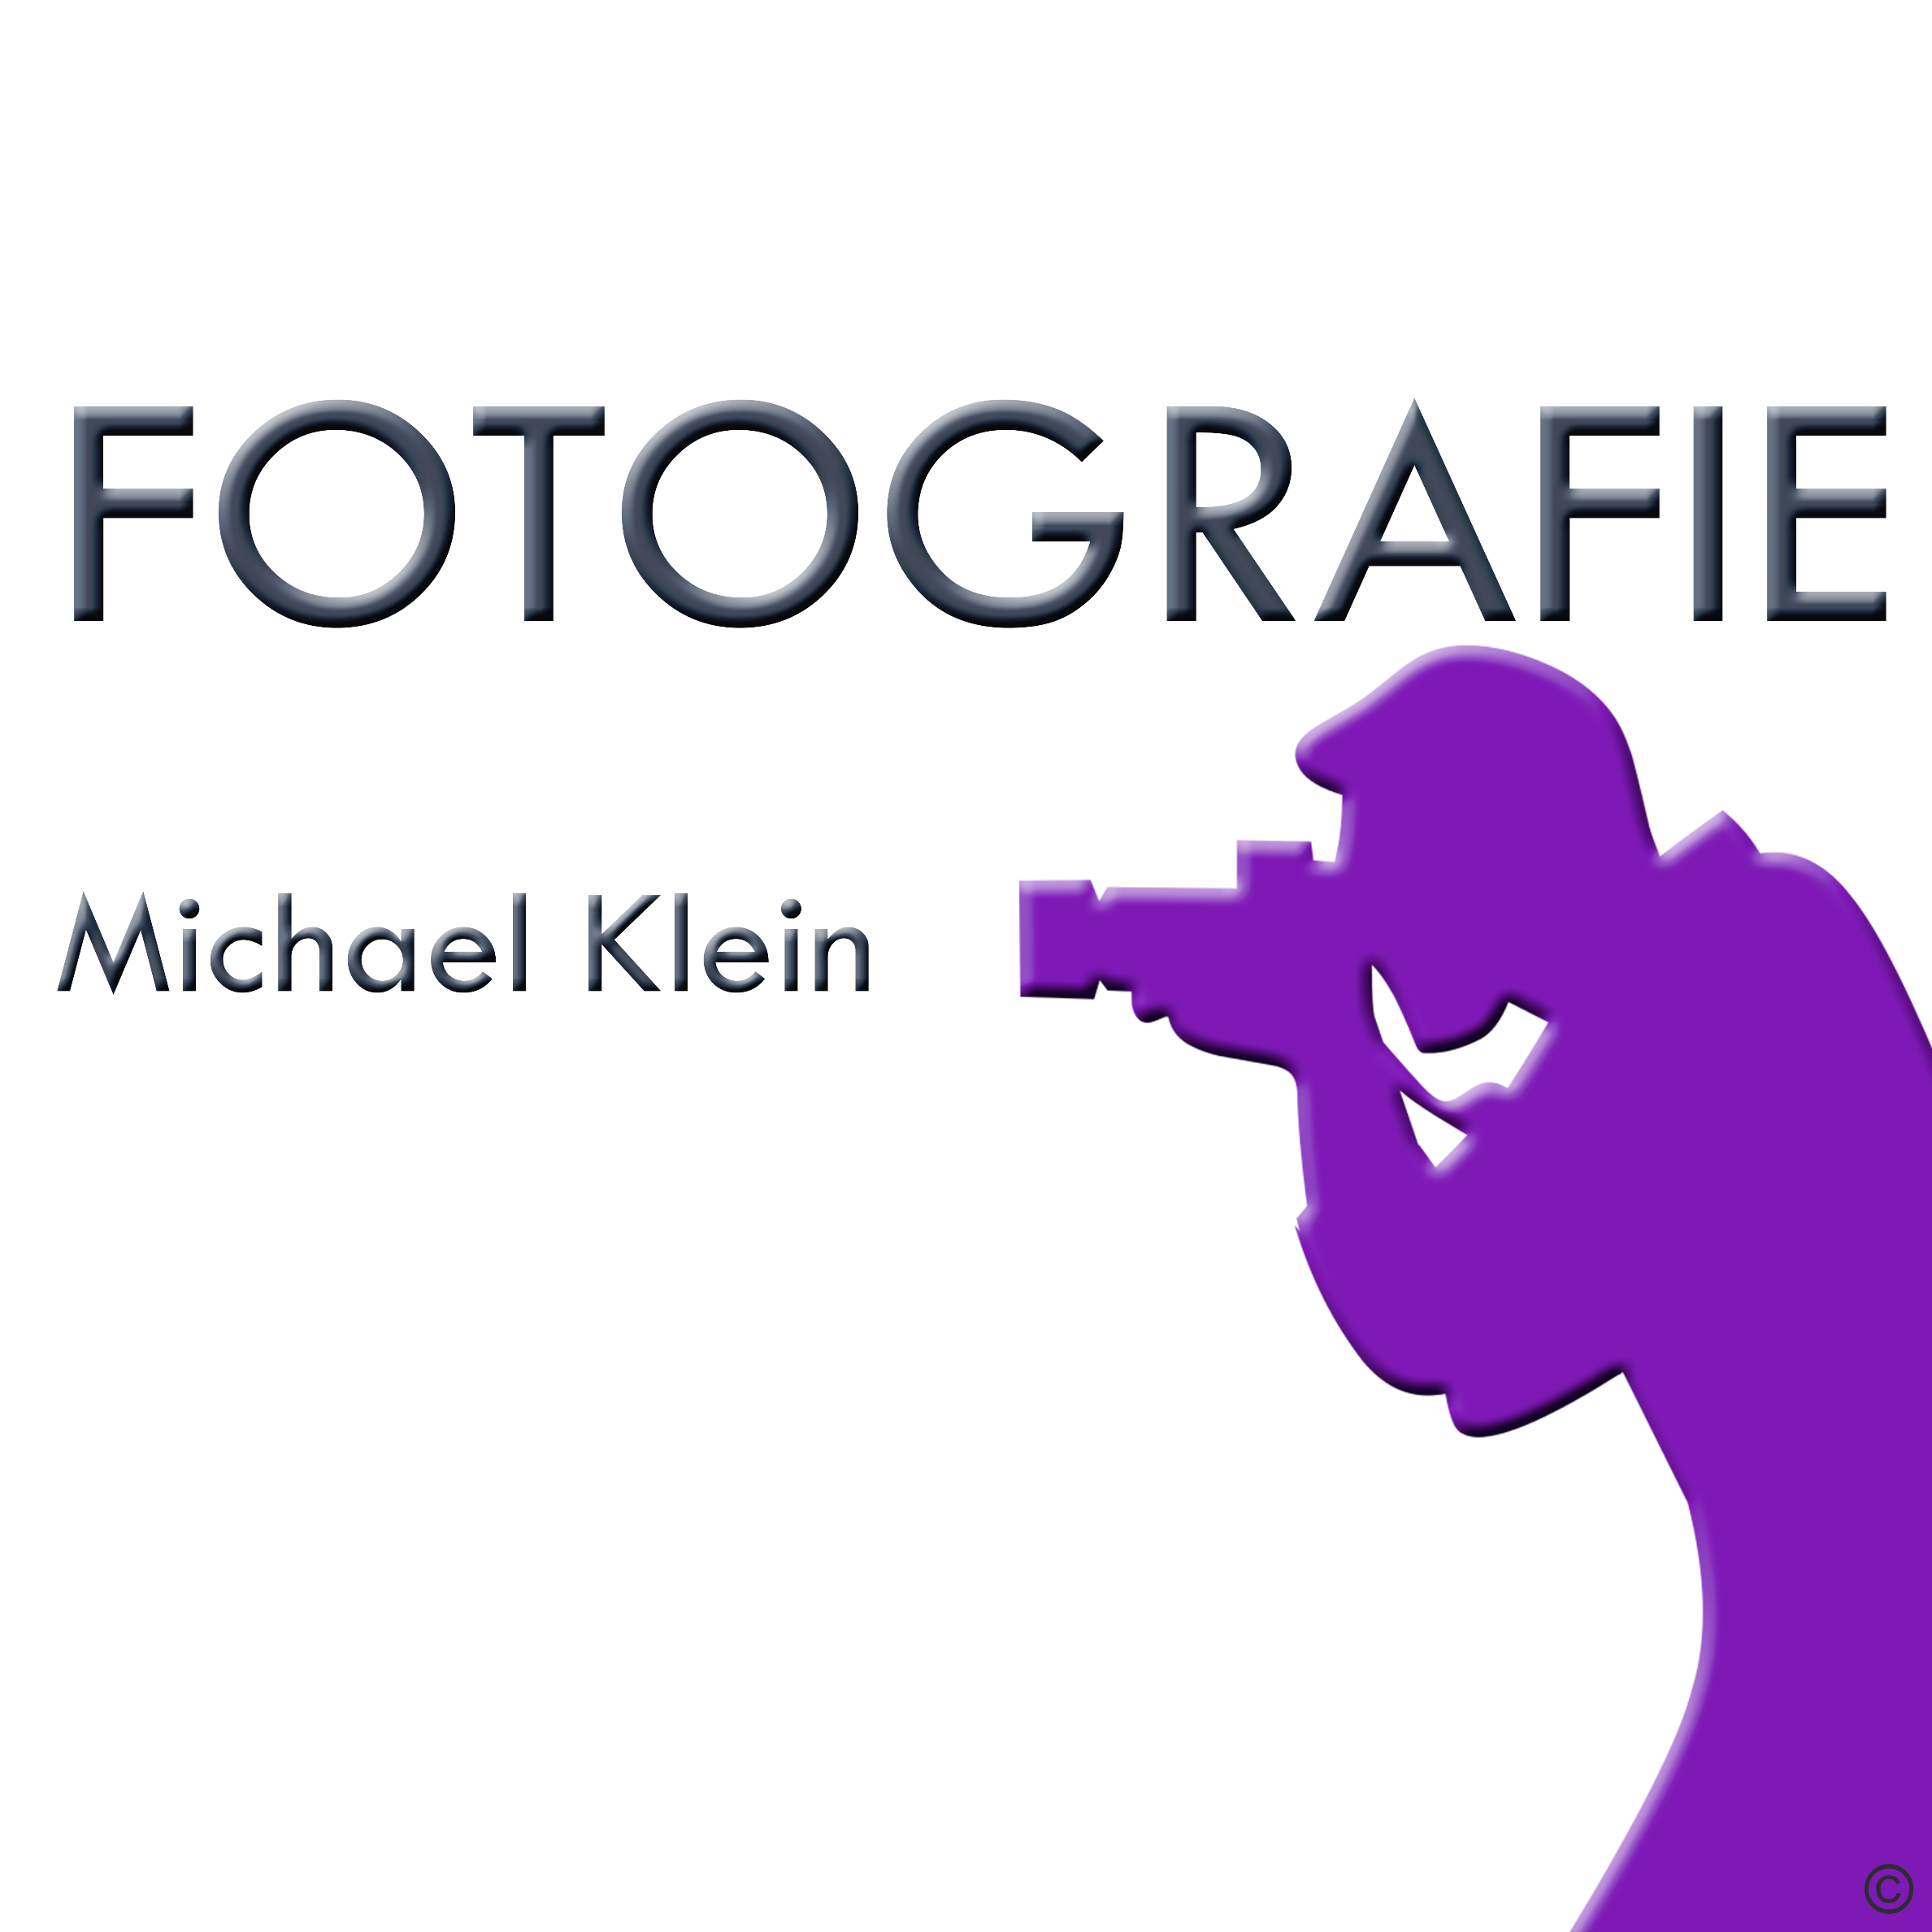 Fotograf Michael Klein